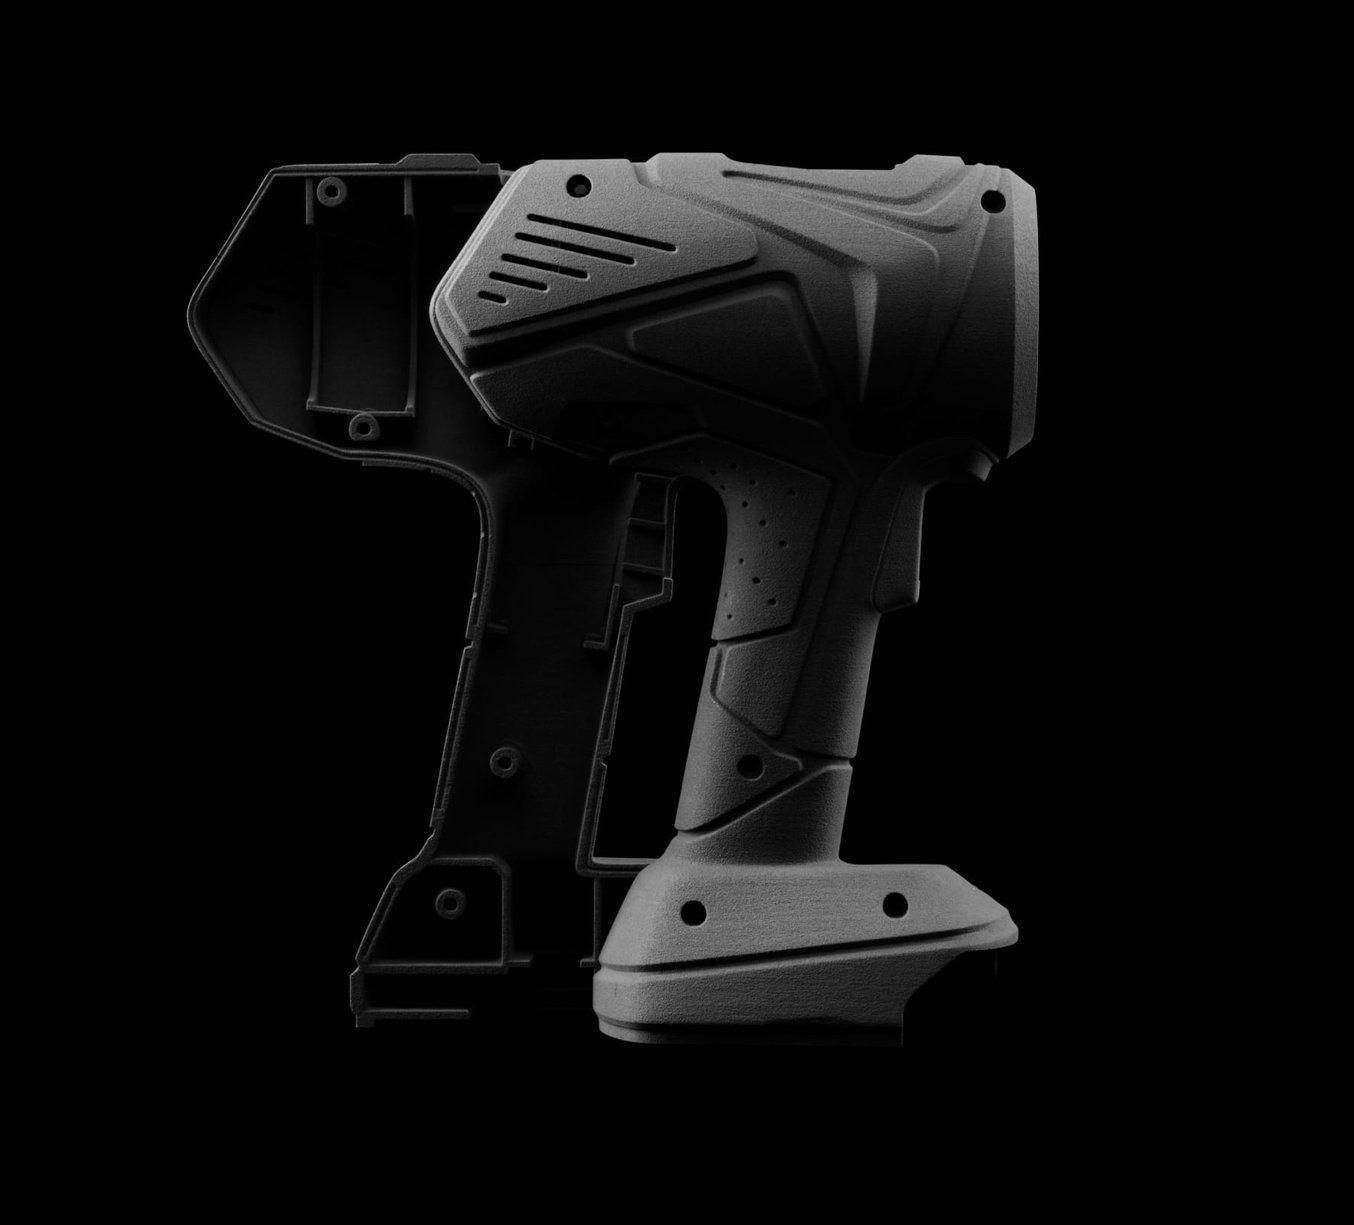 fuse-gallery-drill.jpg__1354x0_q85_subsampling-2